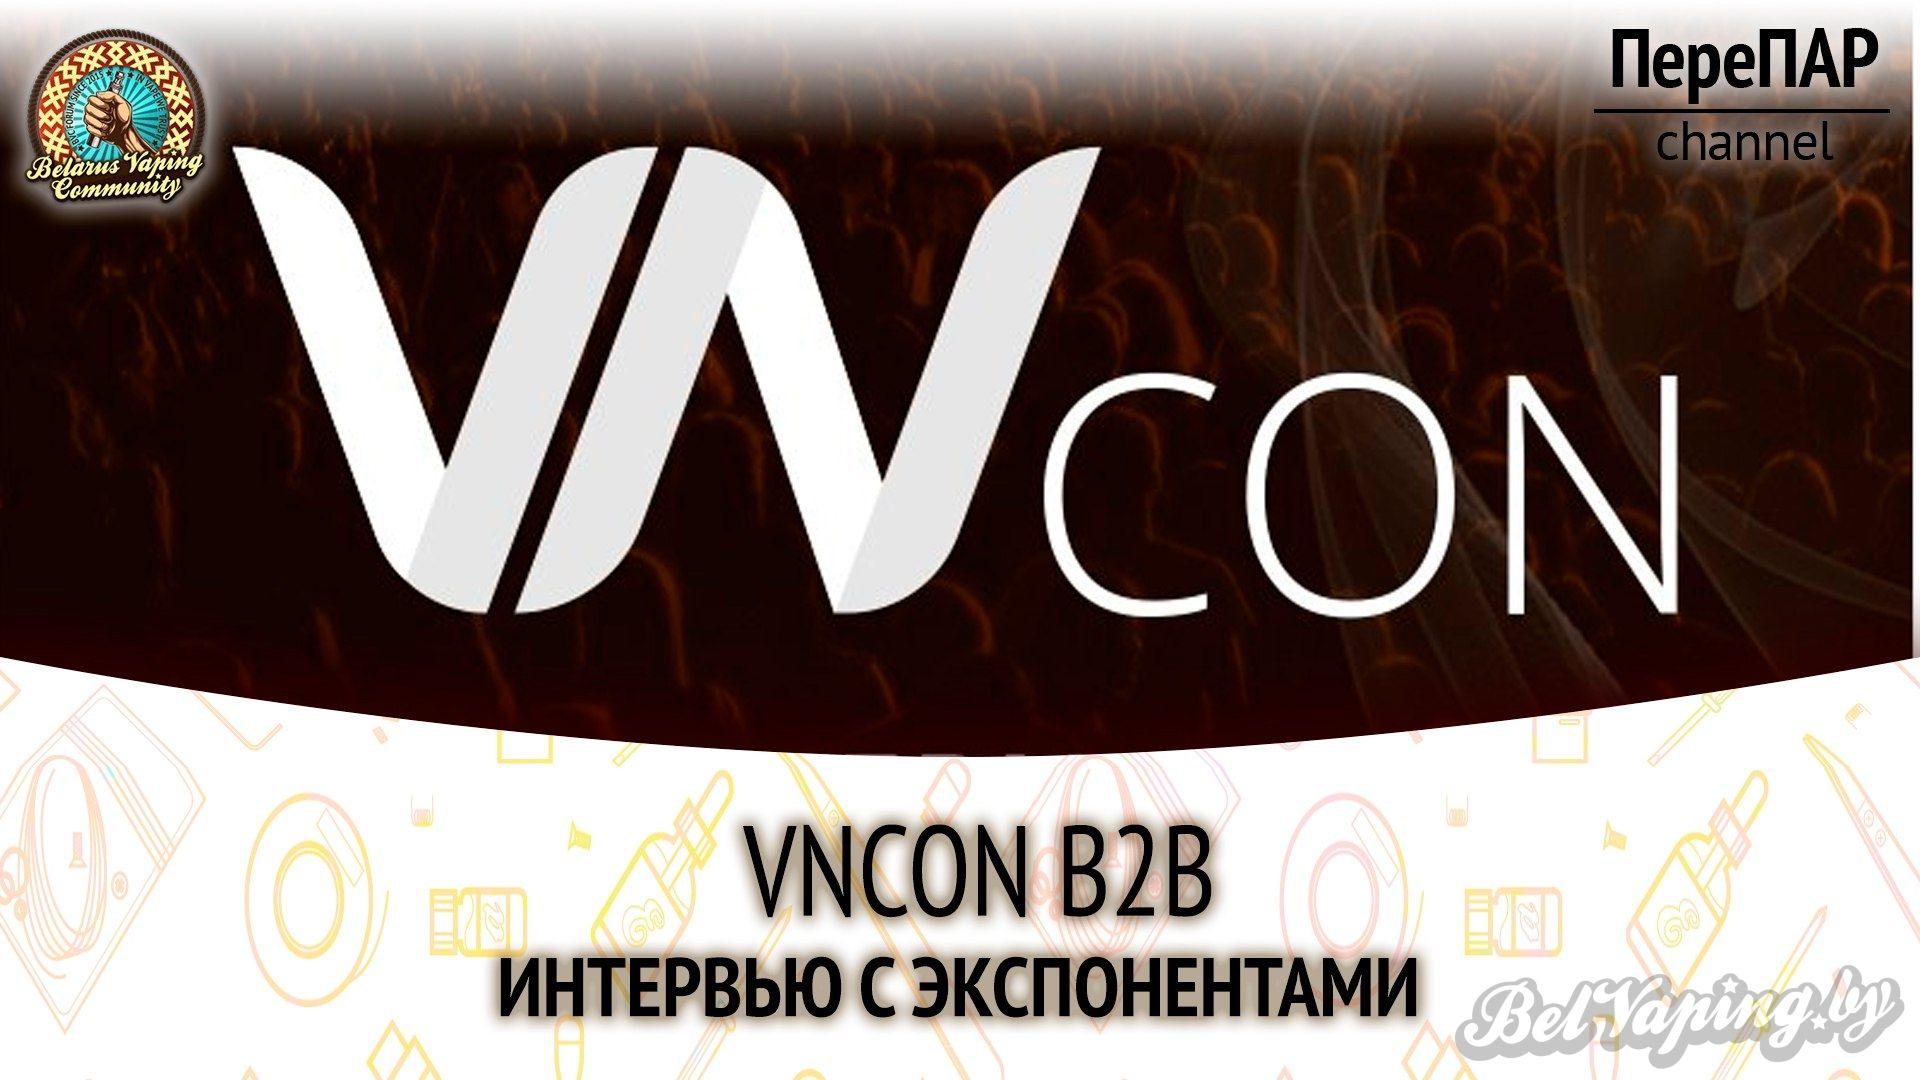 Отчет с выставки VN CON MINSK 2016 от канала PerePAR